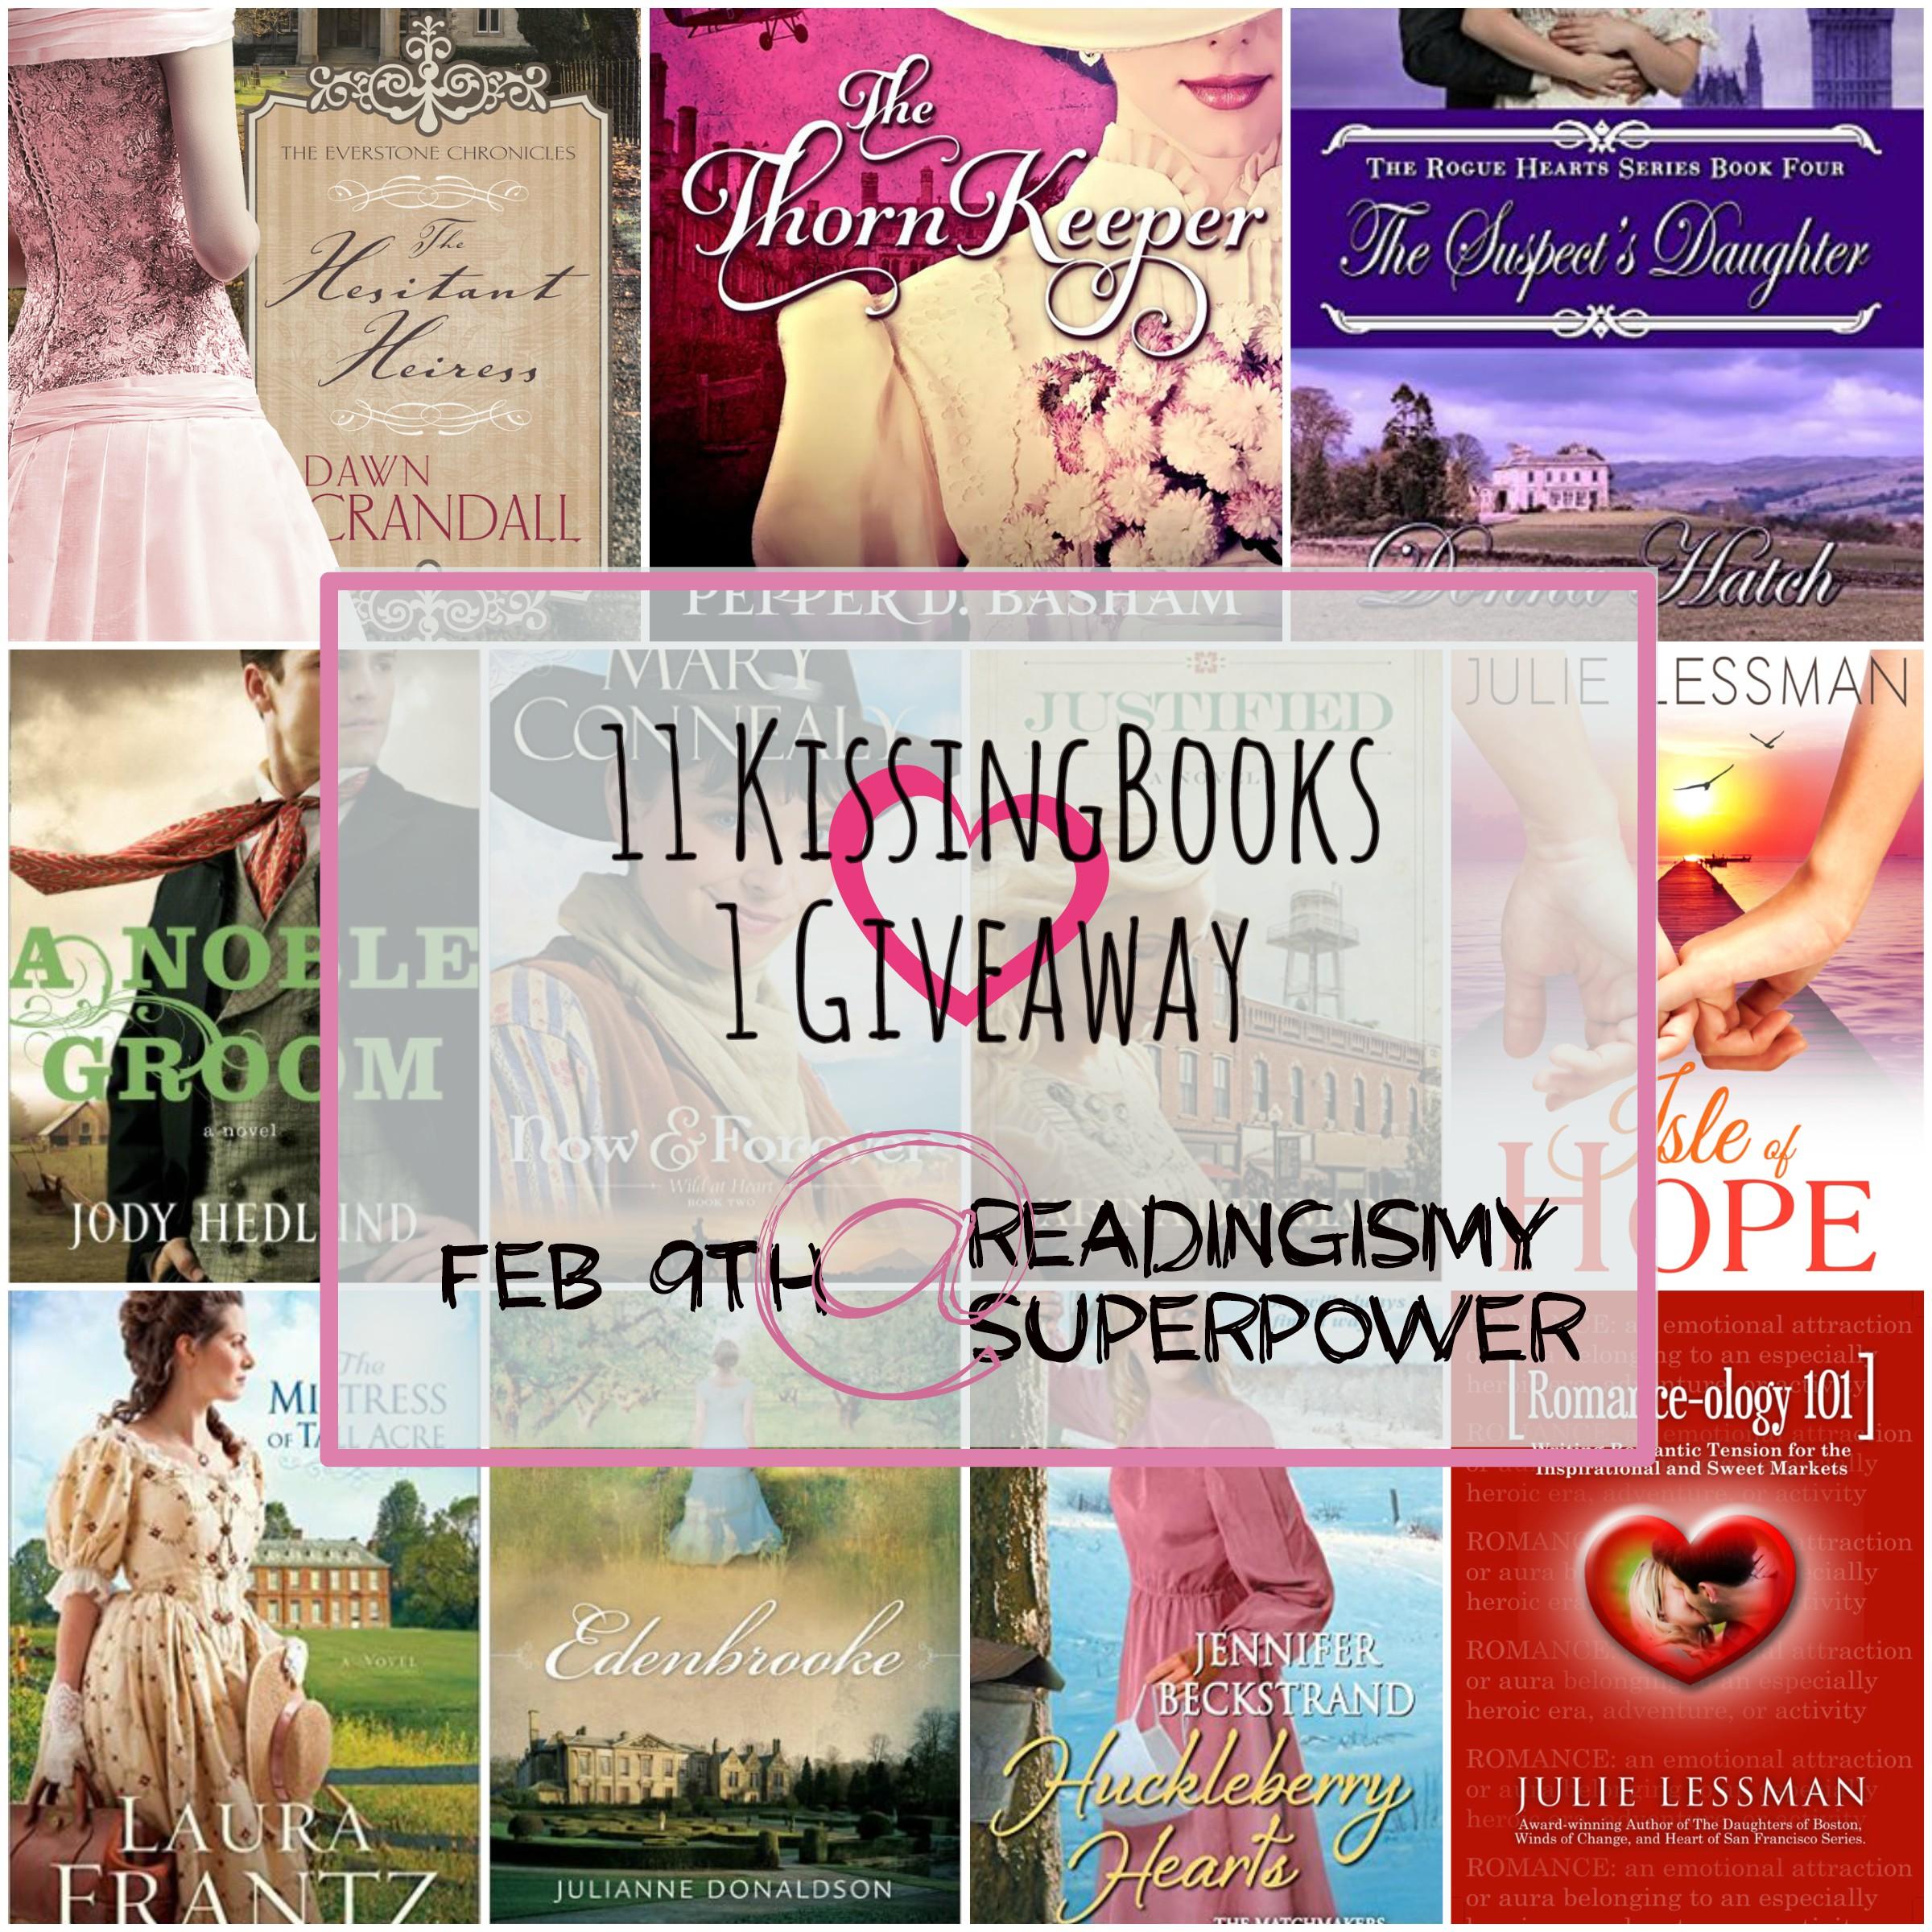 kissingbook giveaway